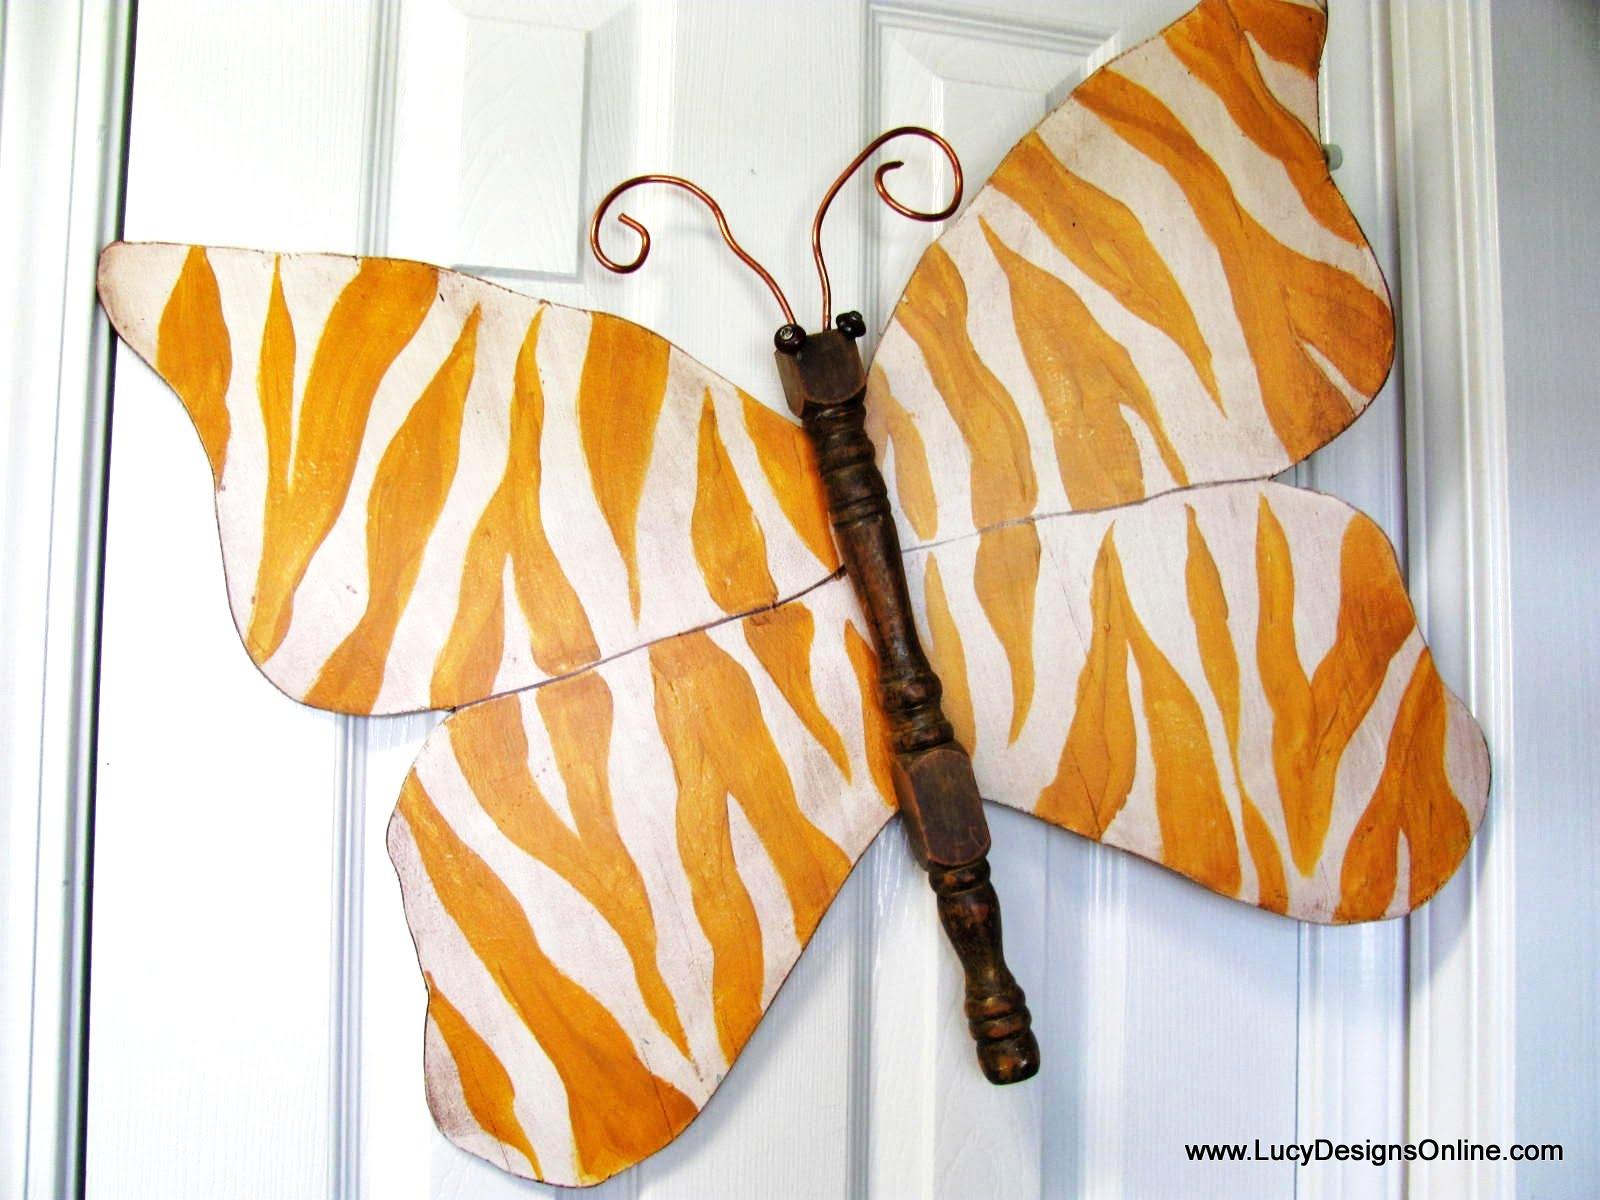 New yellow zebra butterfly art